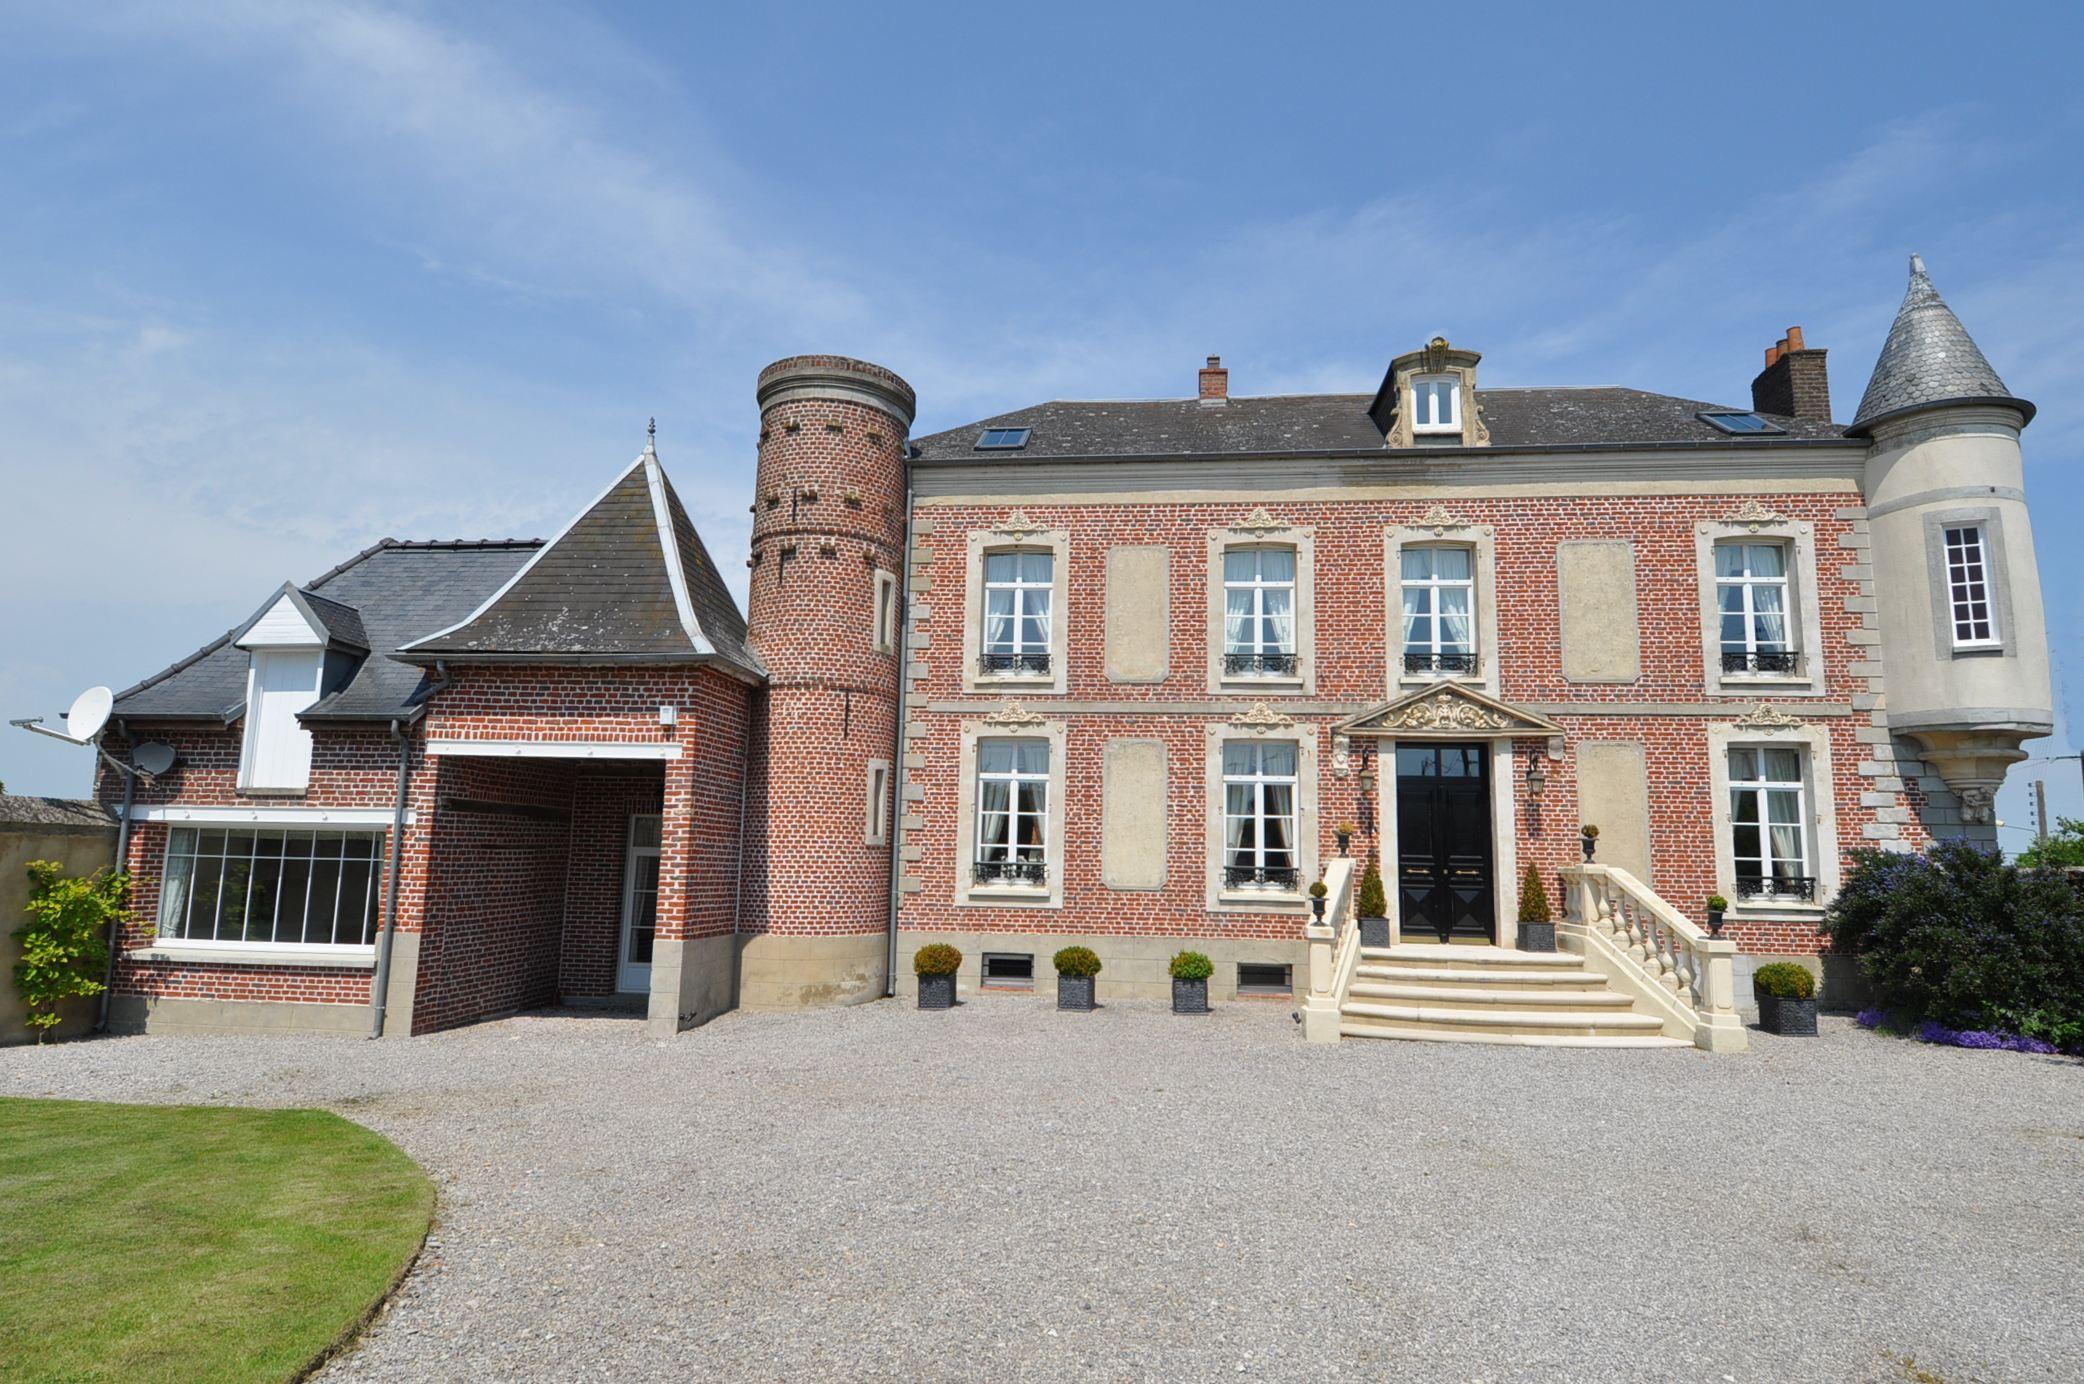 Hardelot At 40 Kms, Beautiful Xixth Manor Renovated, 565 M2, 6 Bedrooms